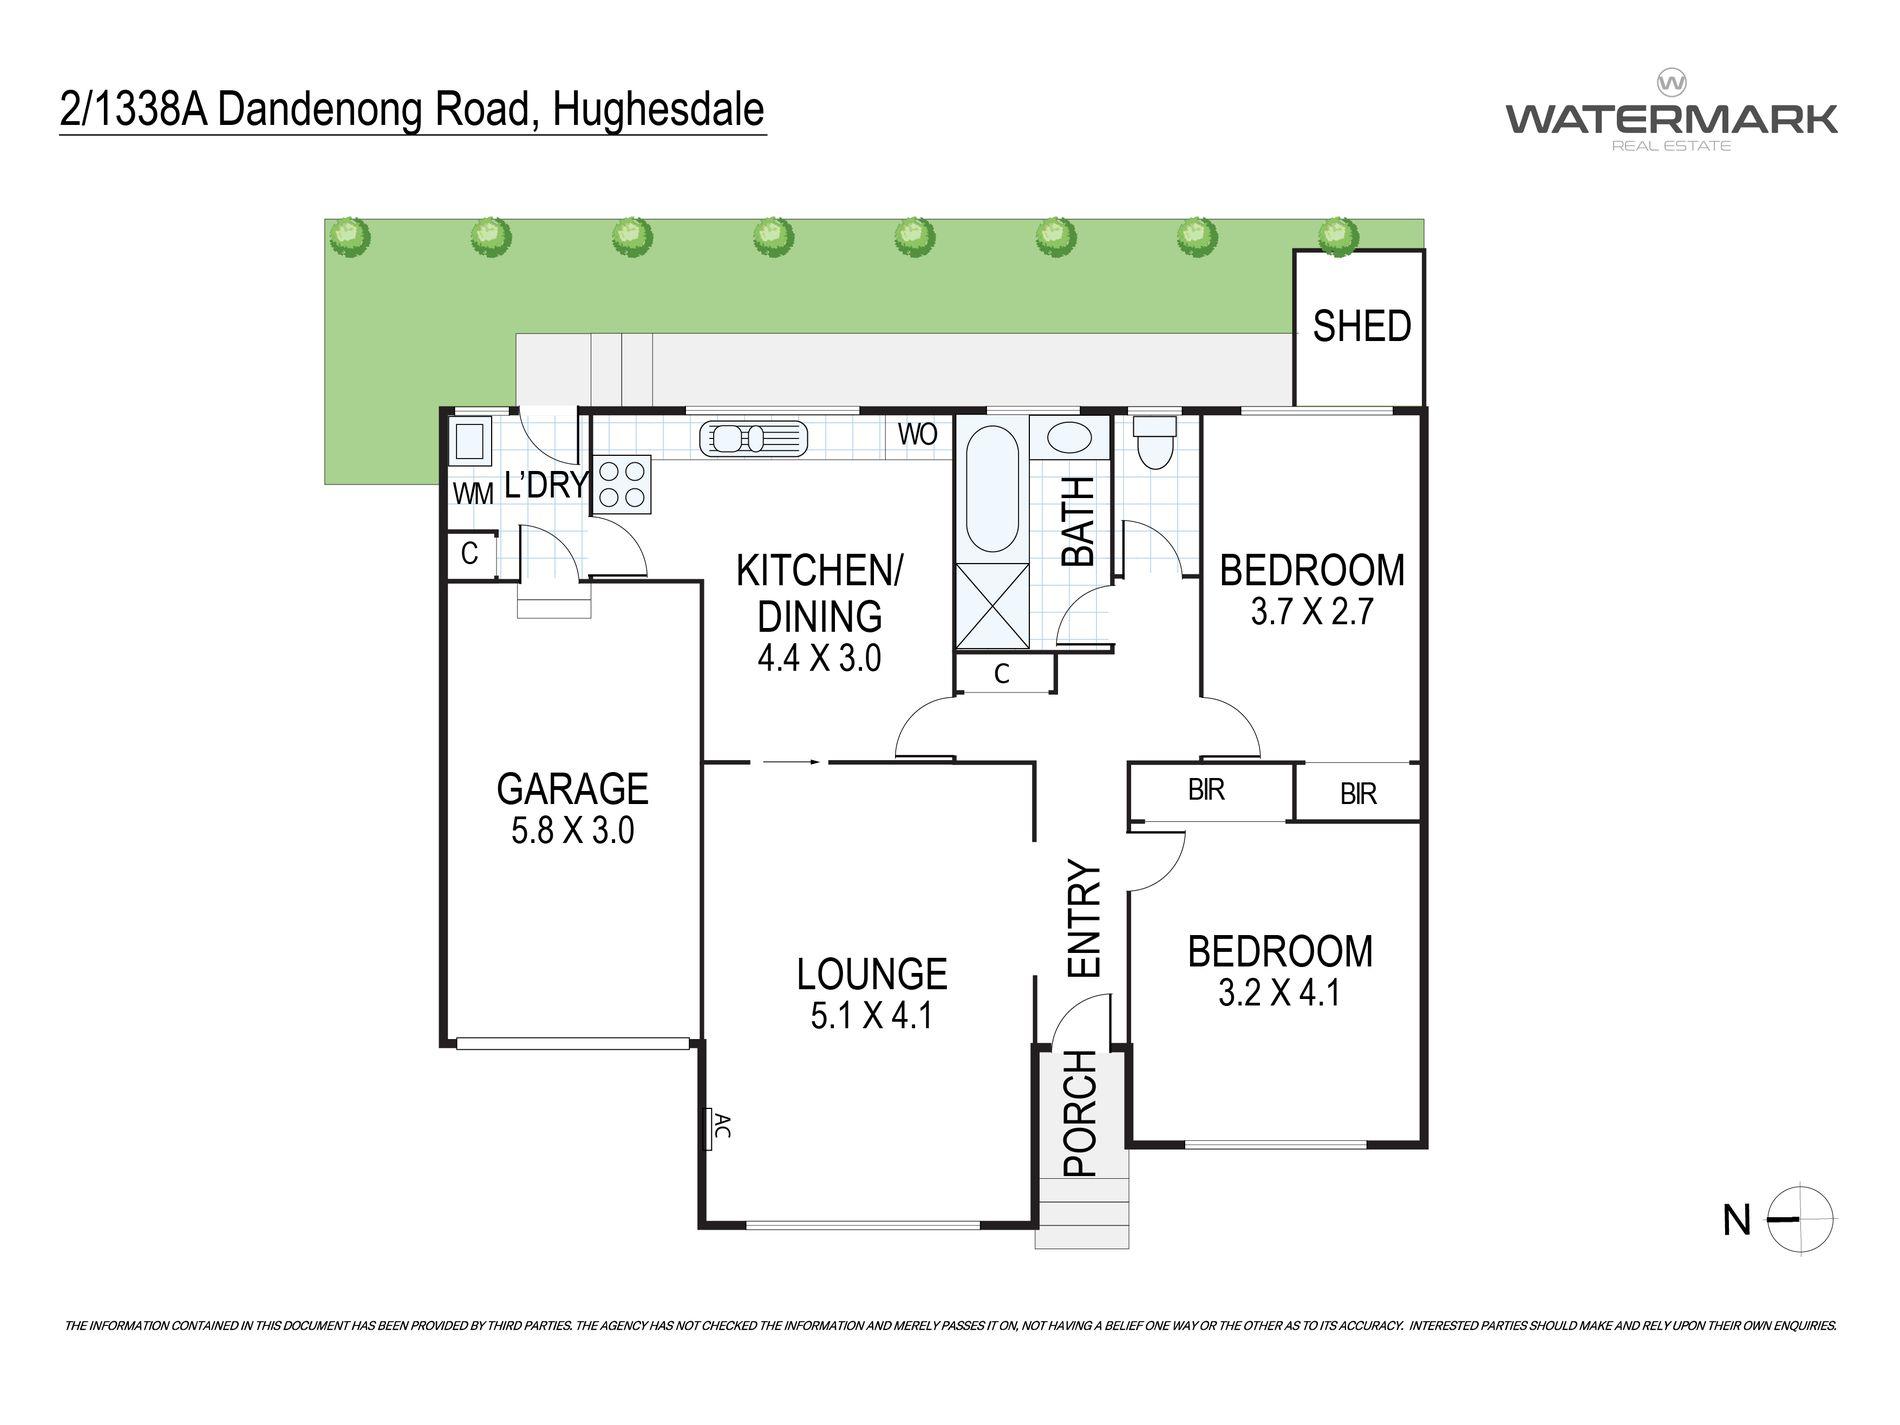 2 / 1338A Dandenong Road, Hughesdale